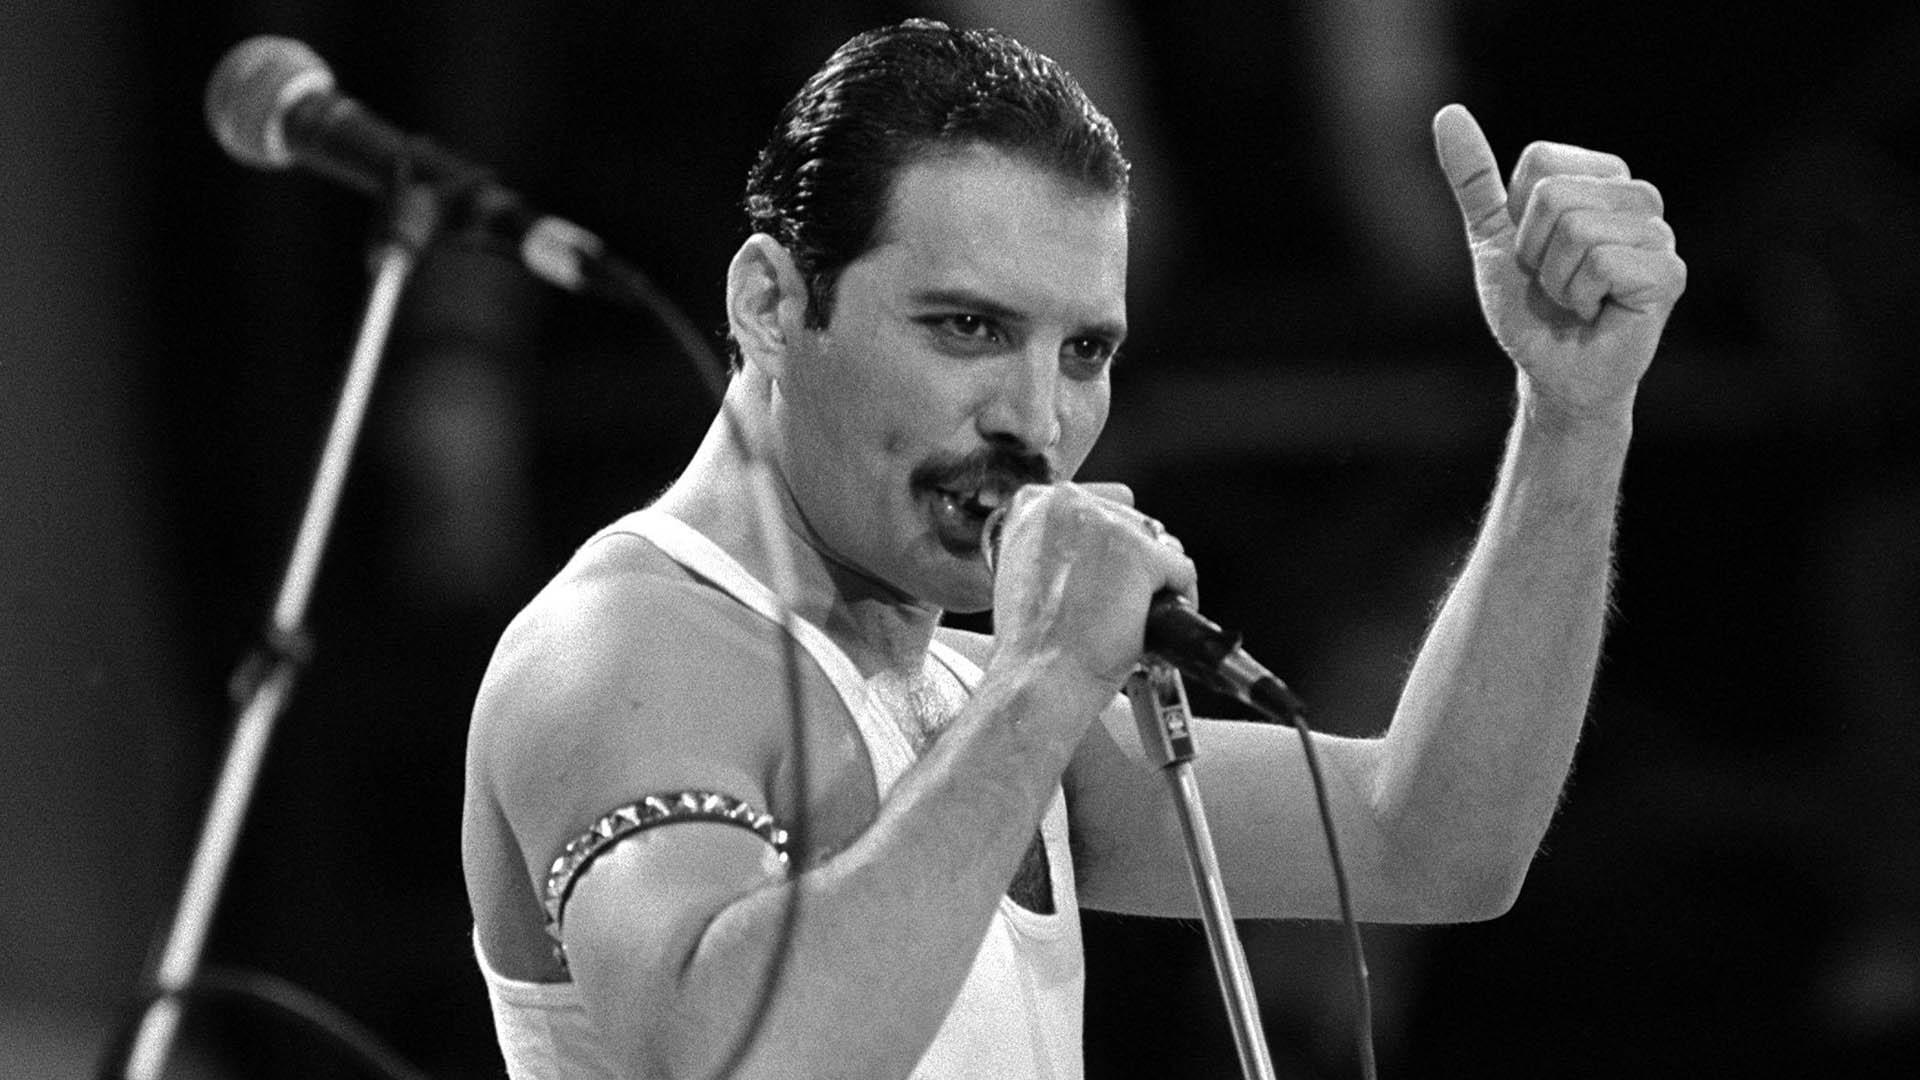 Casa di Freddie Mercury: Zanzibar, Londra, Montreux